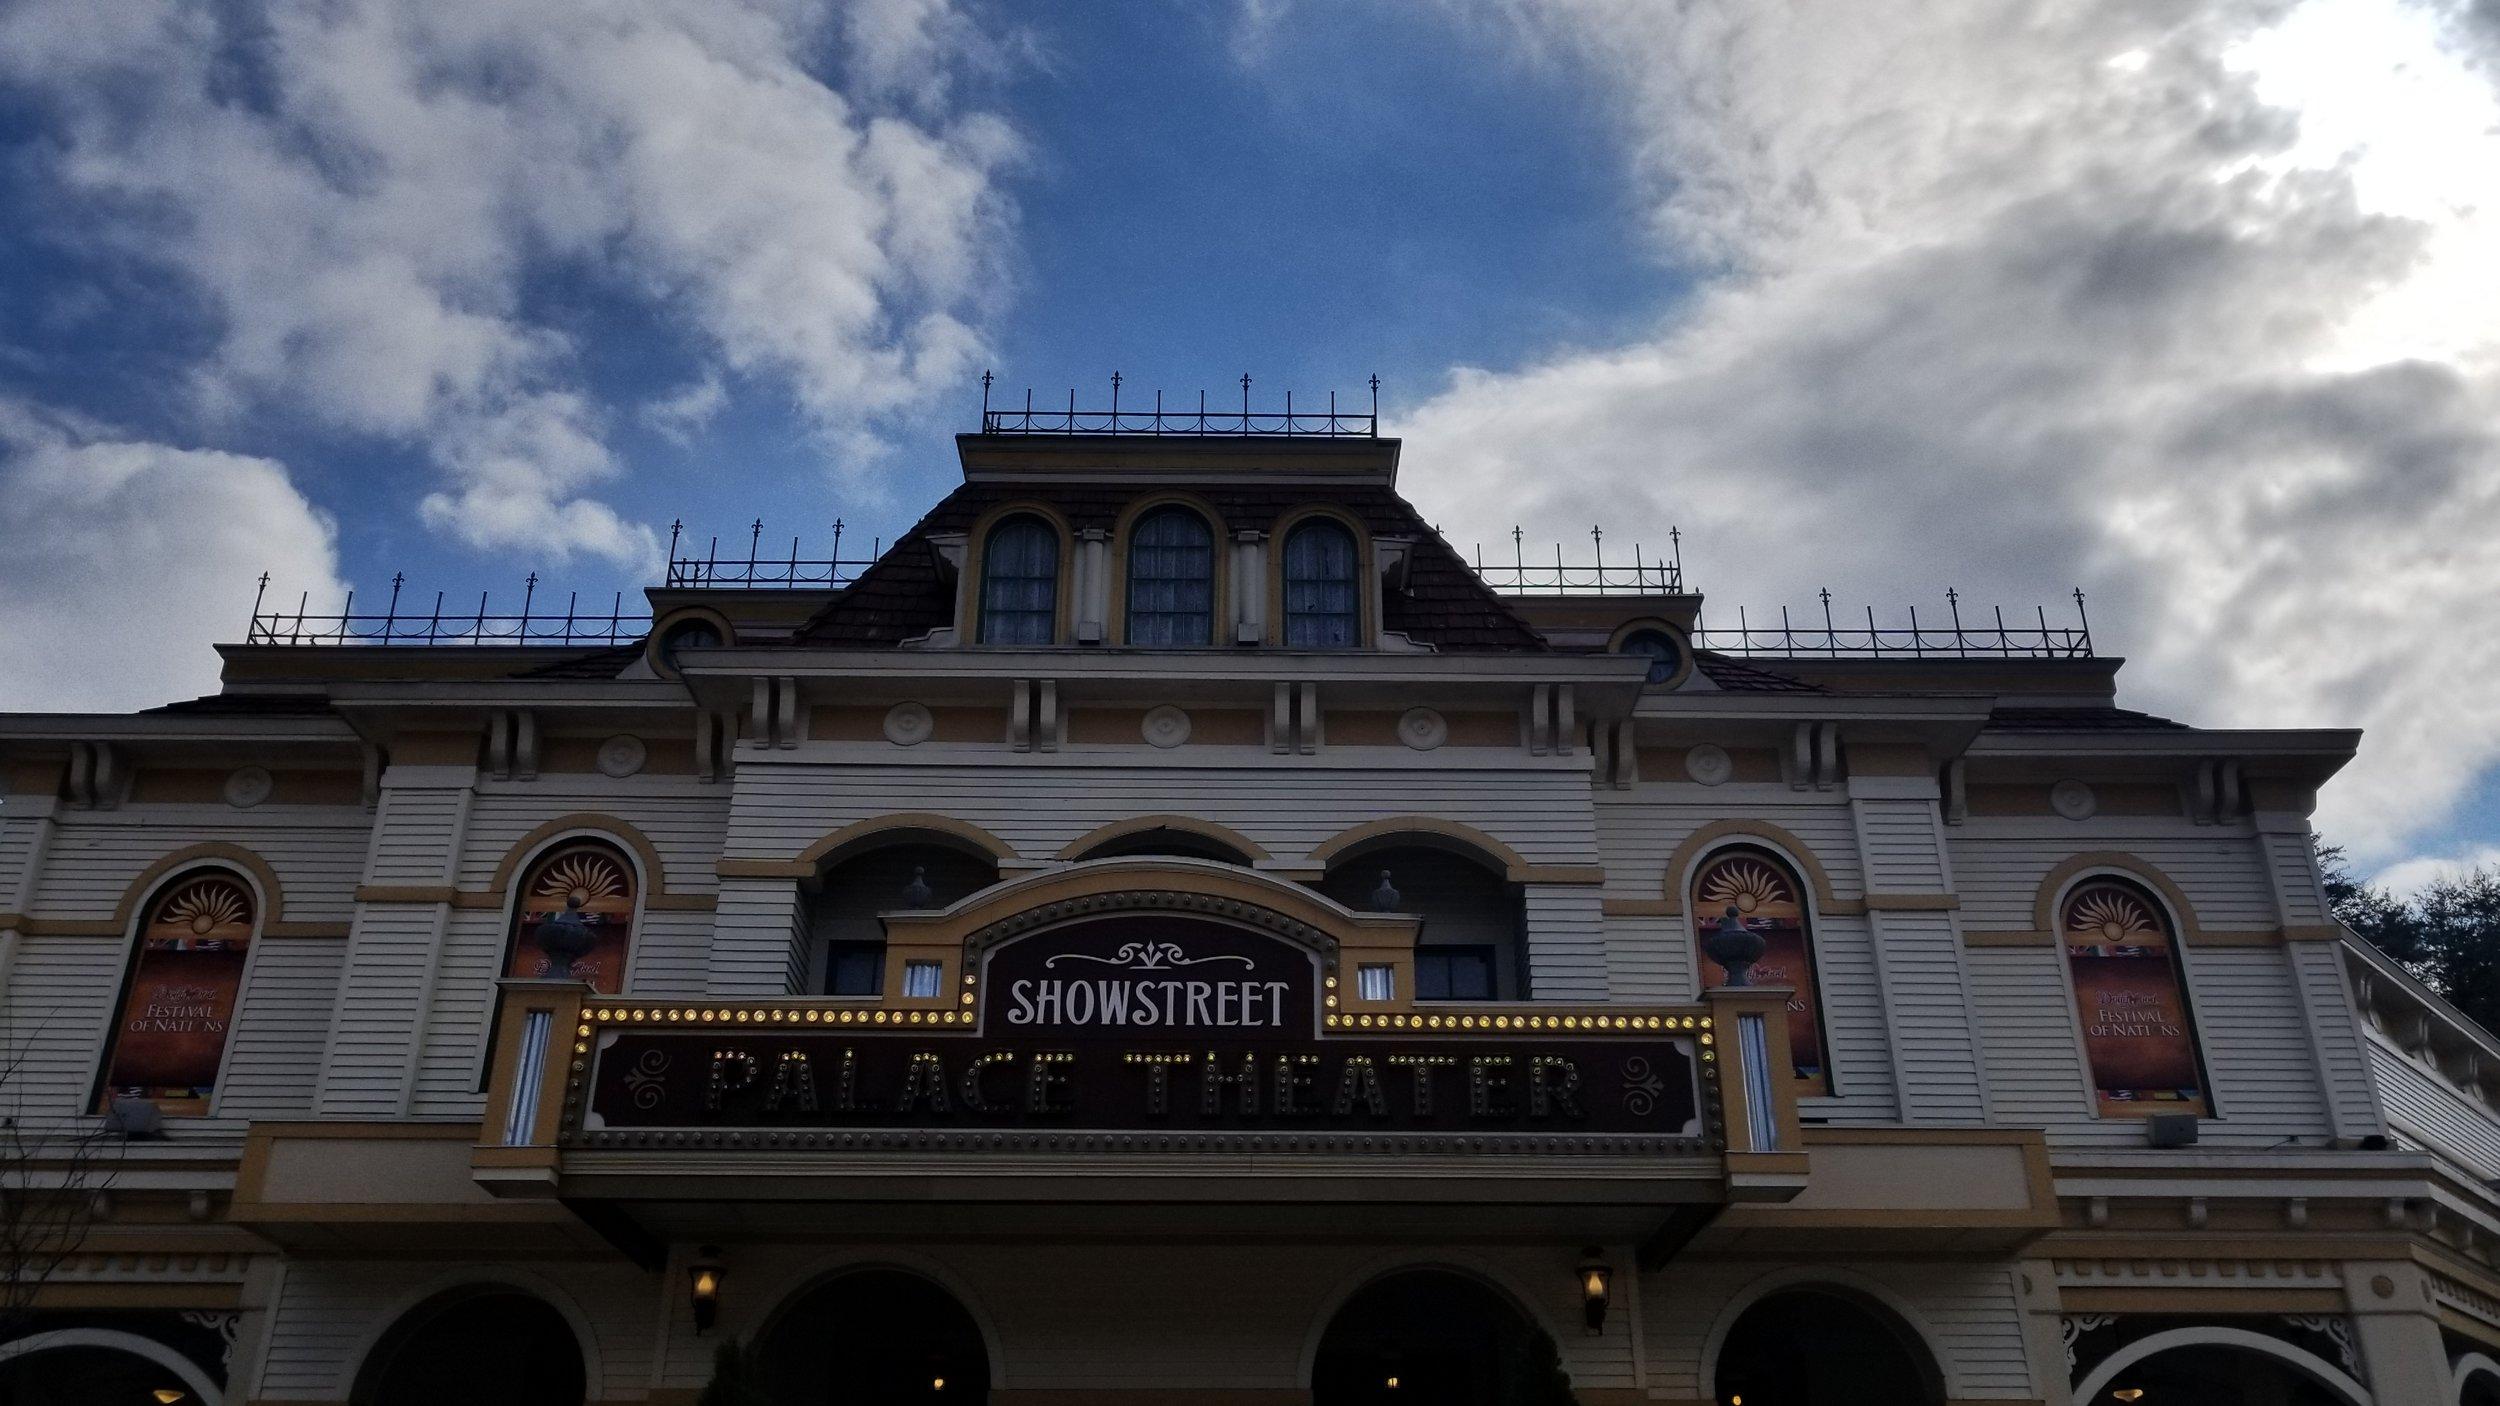 Showstreet Palace